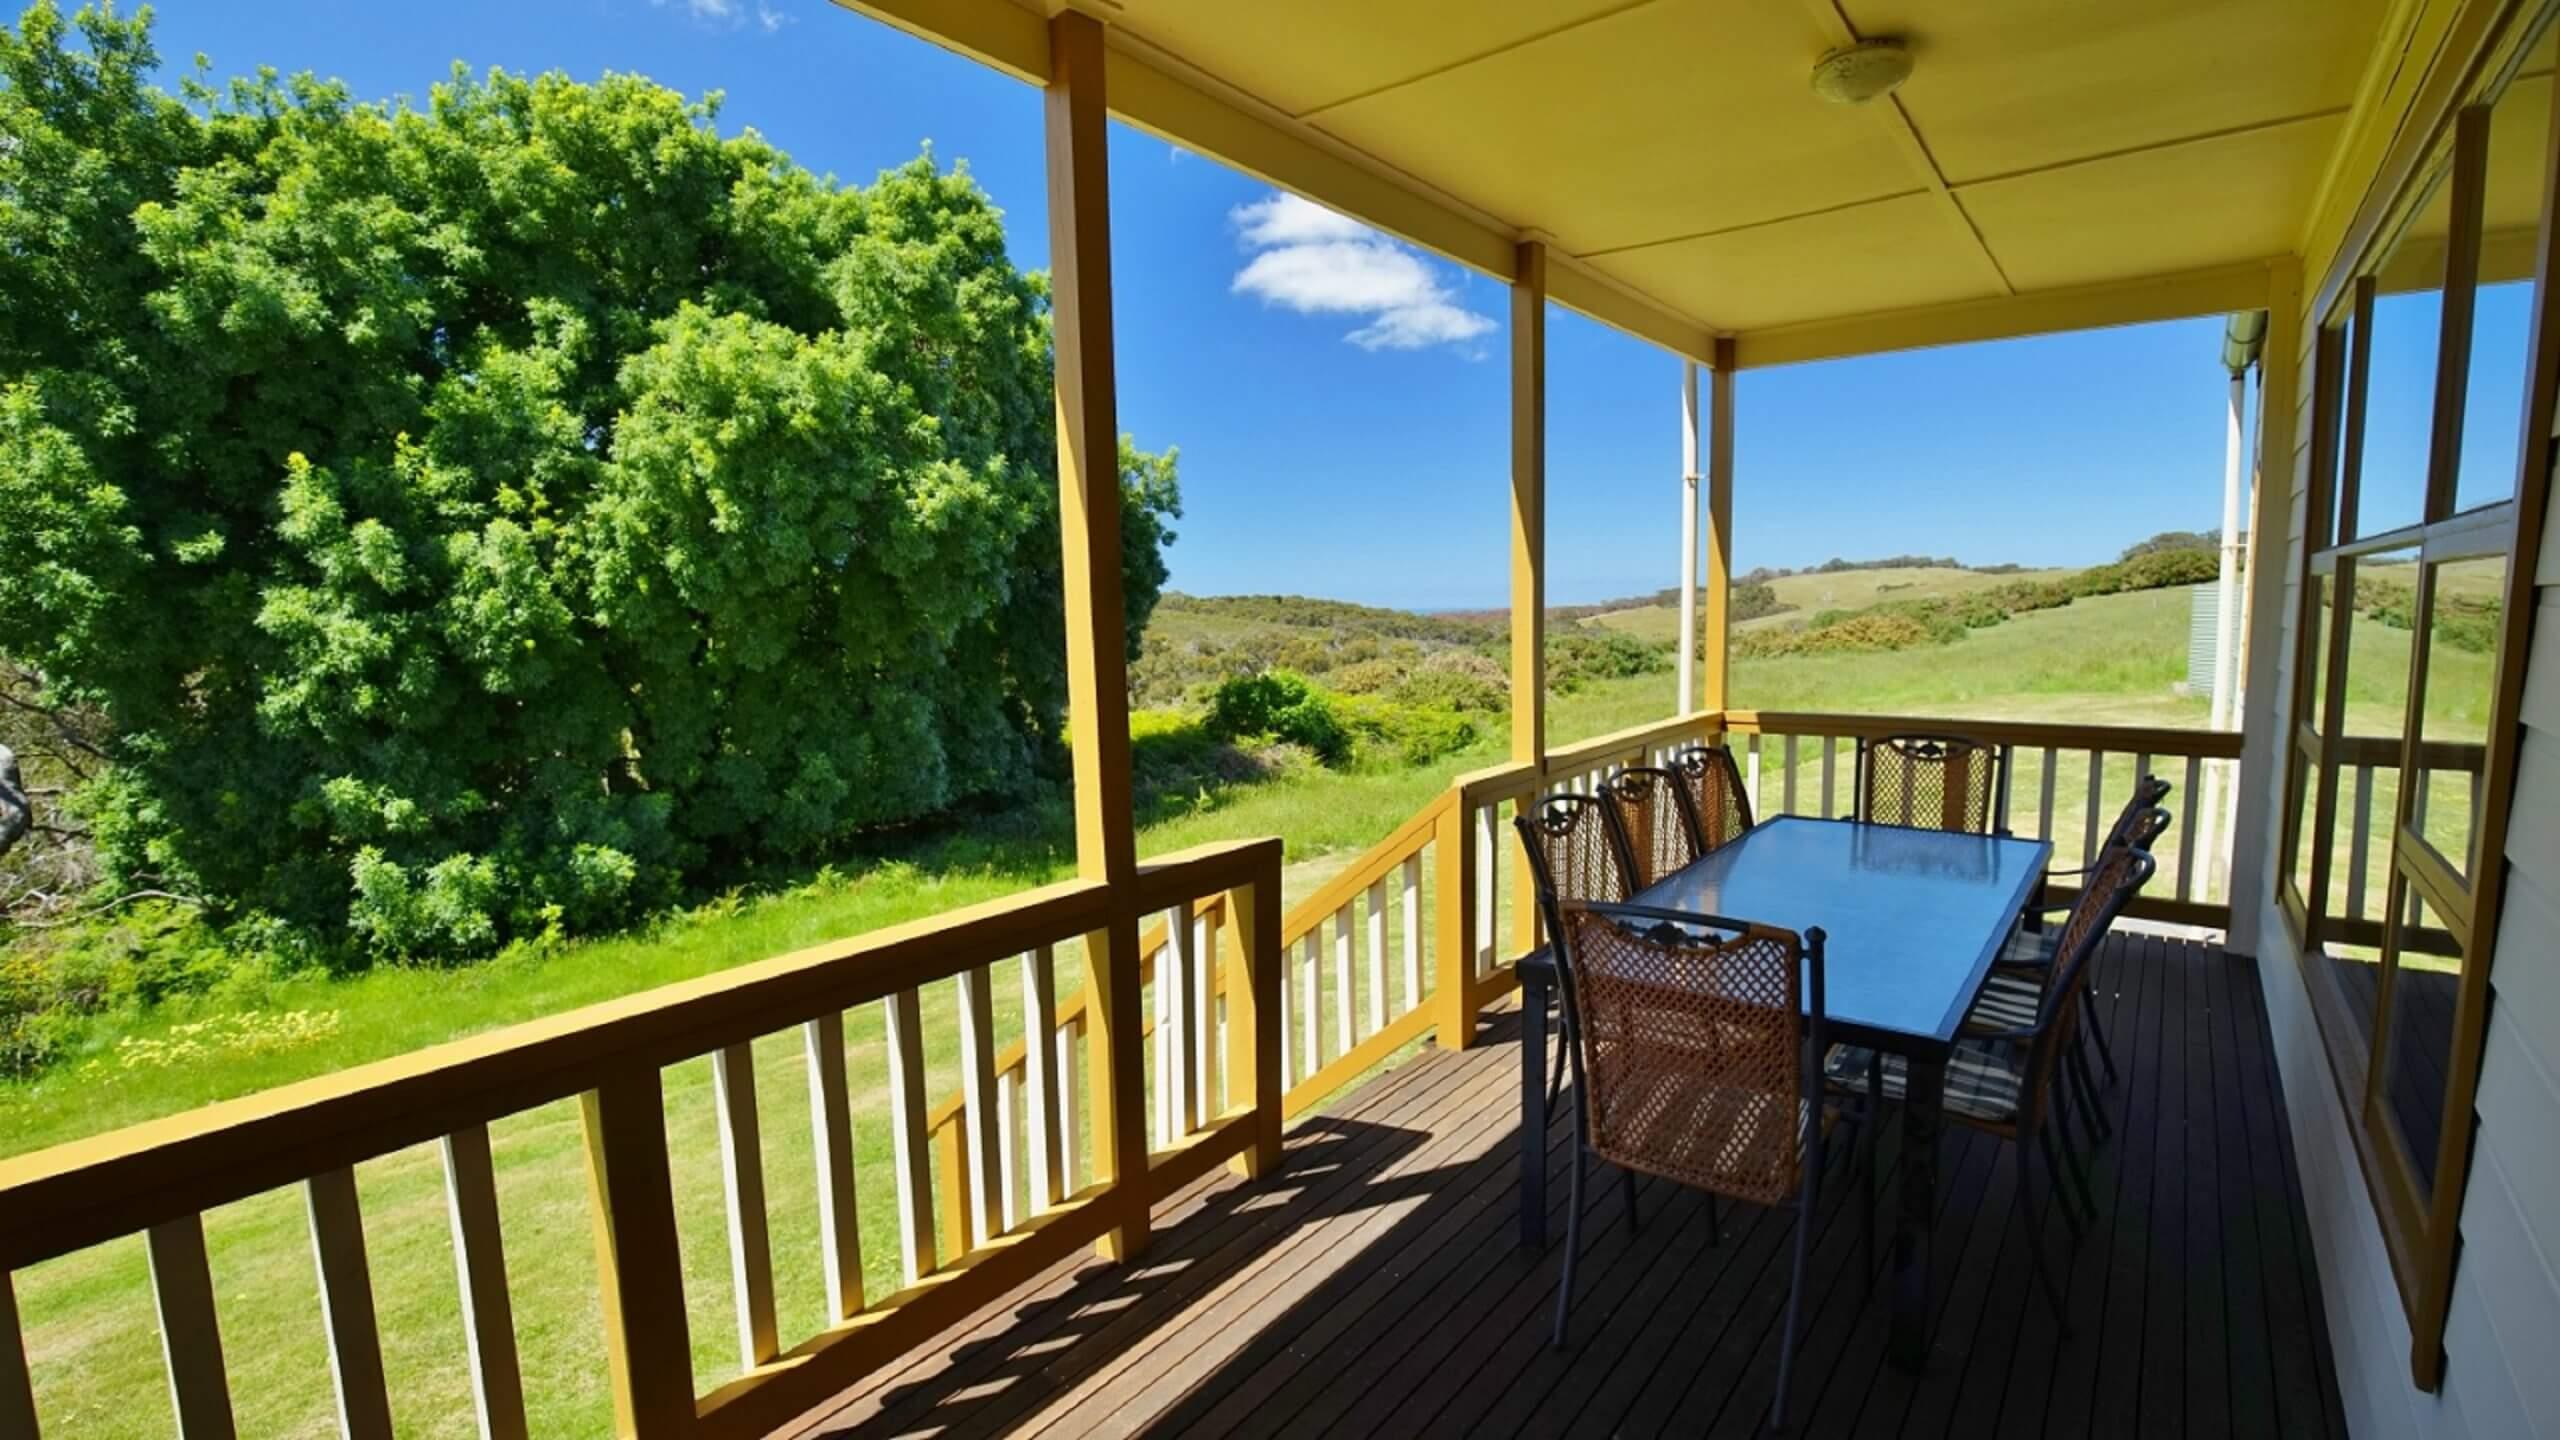 Fleurieu Peninsula accommodation with views